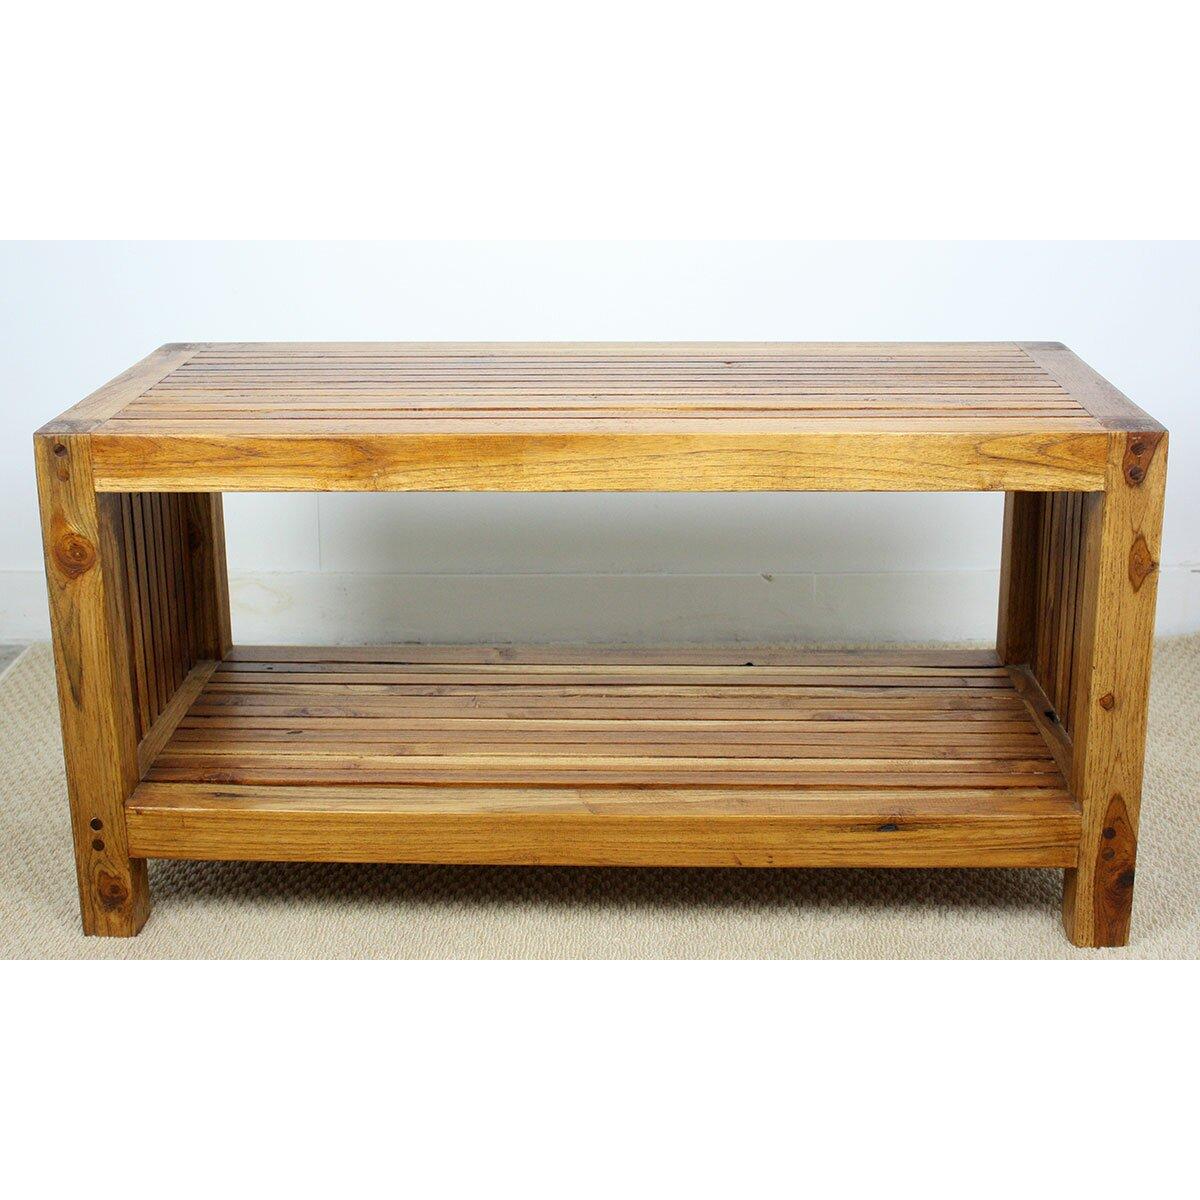 Strata Furniture Teak Slat Coffee Table Reviews